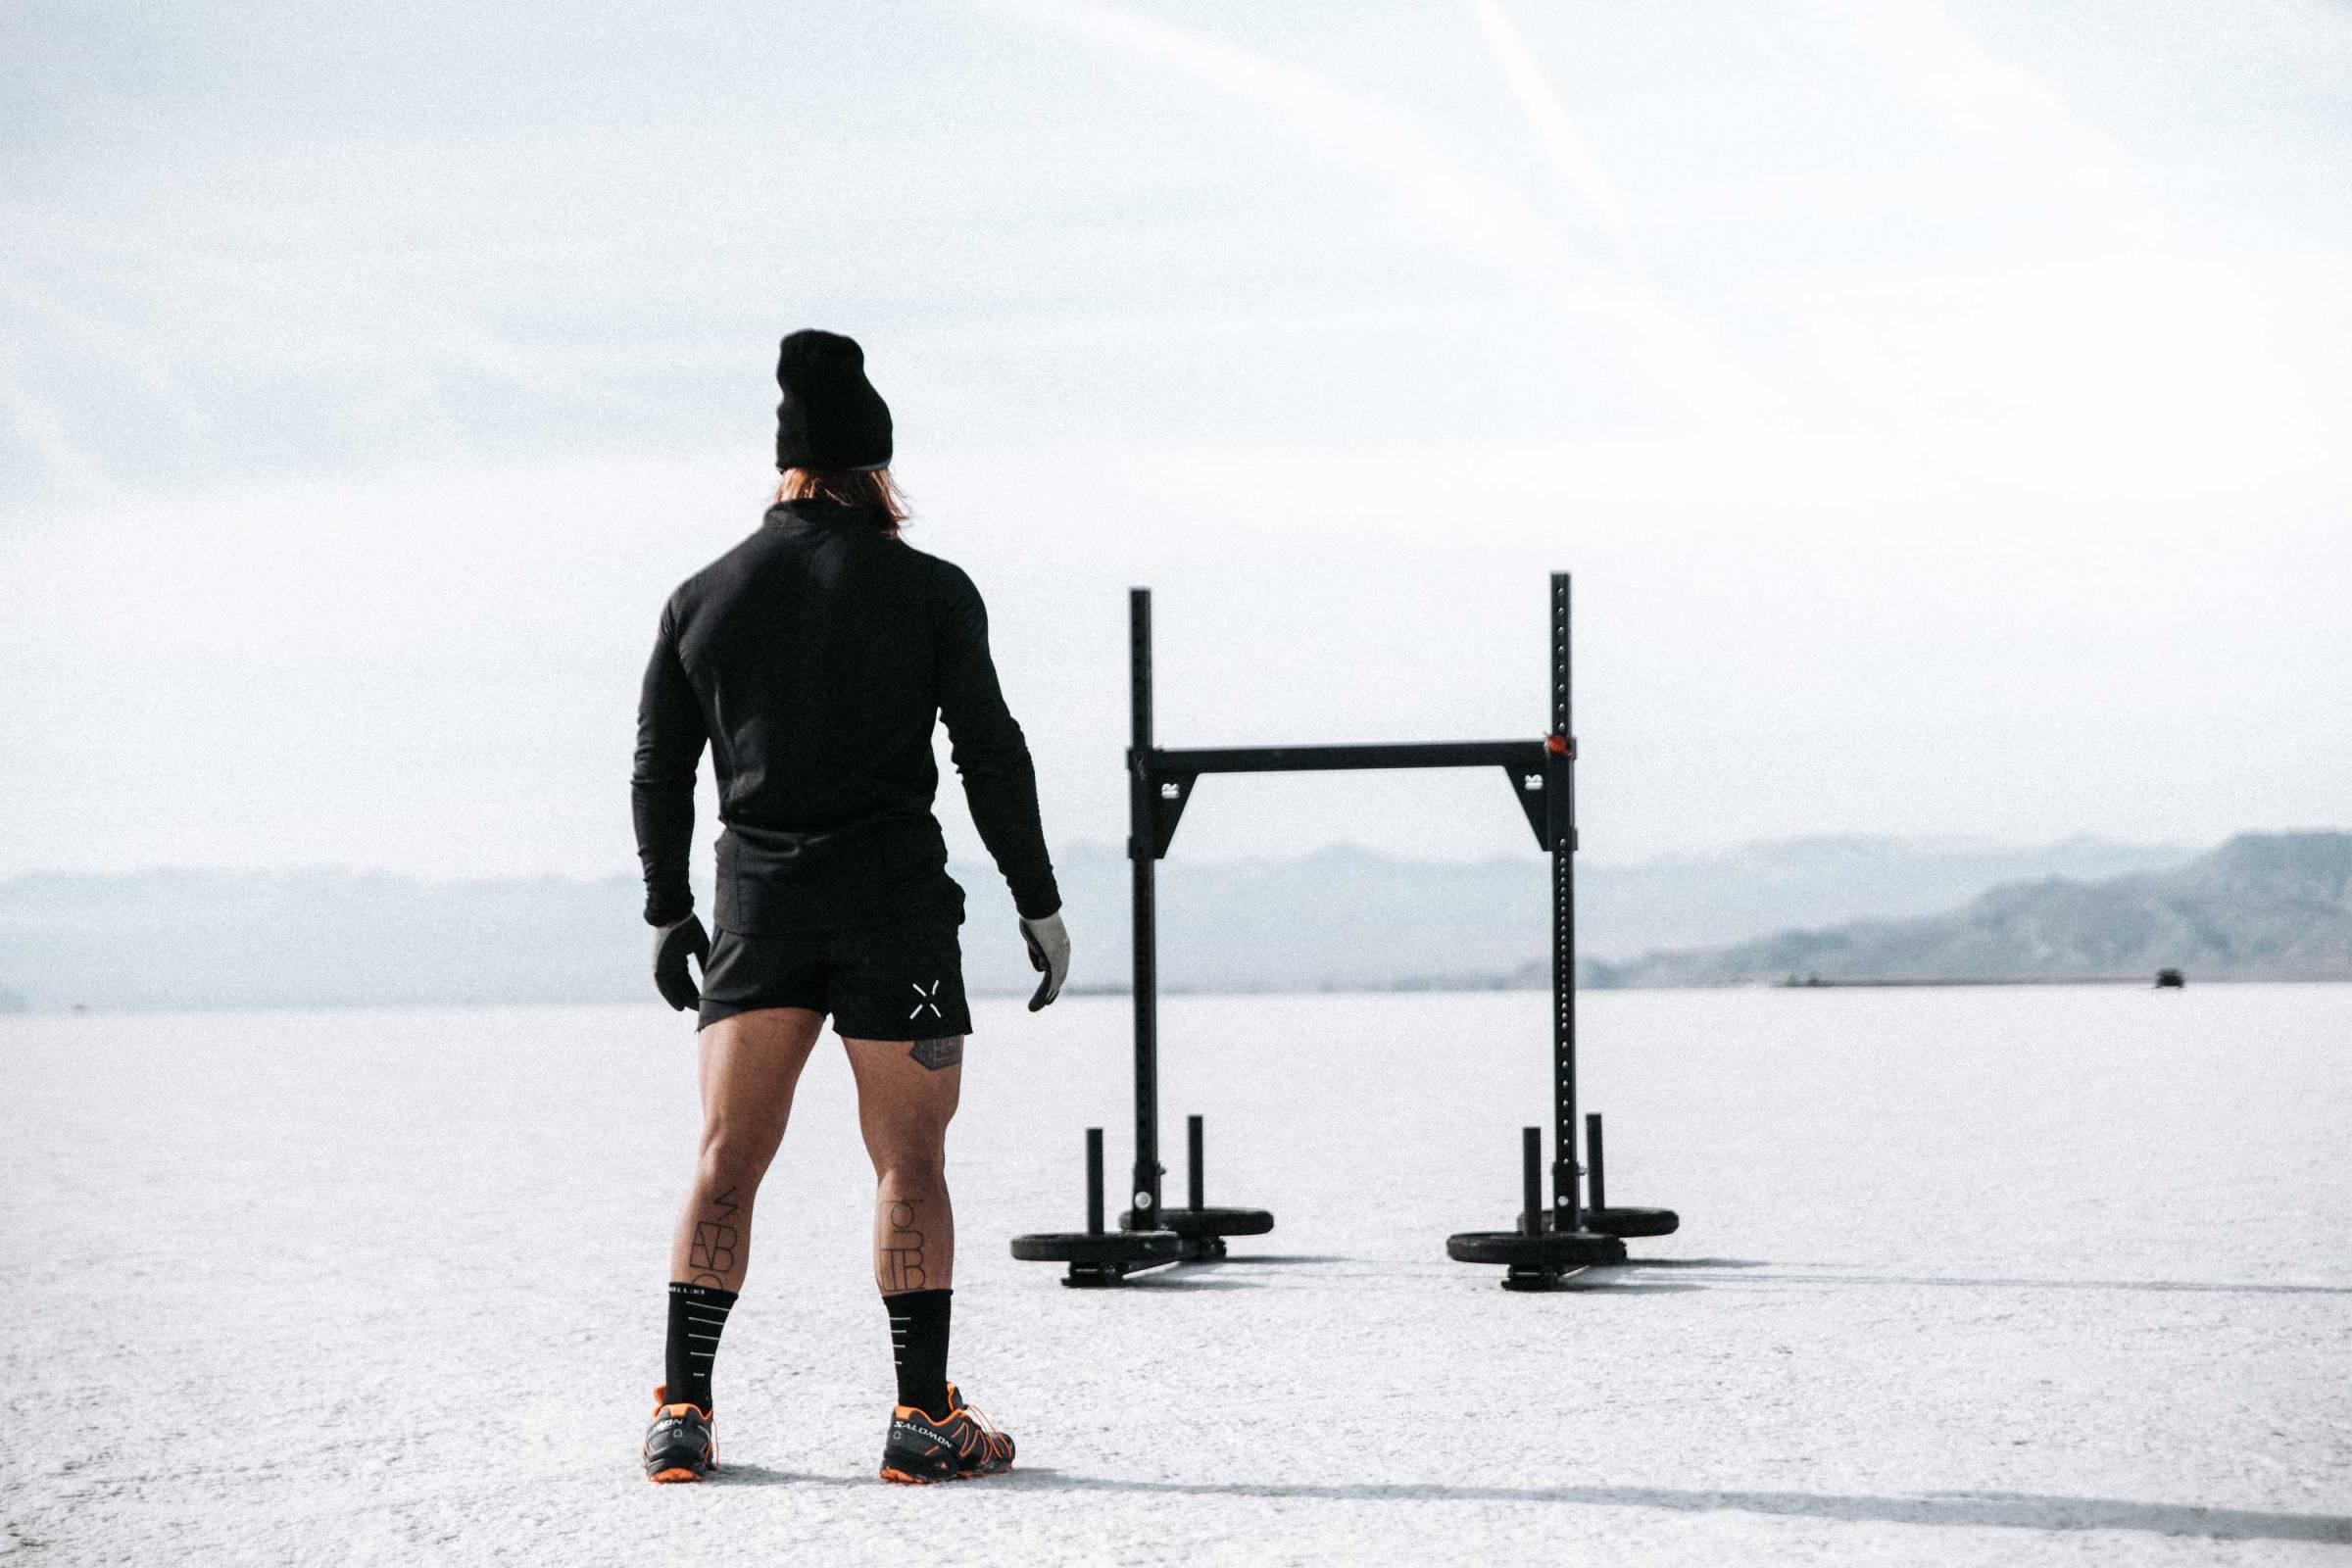 michael miraglia's one-man strongman marathon